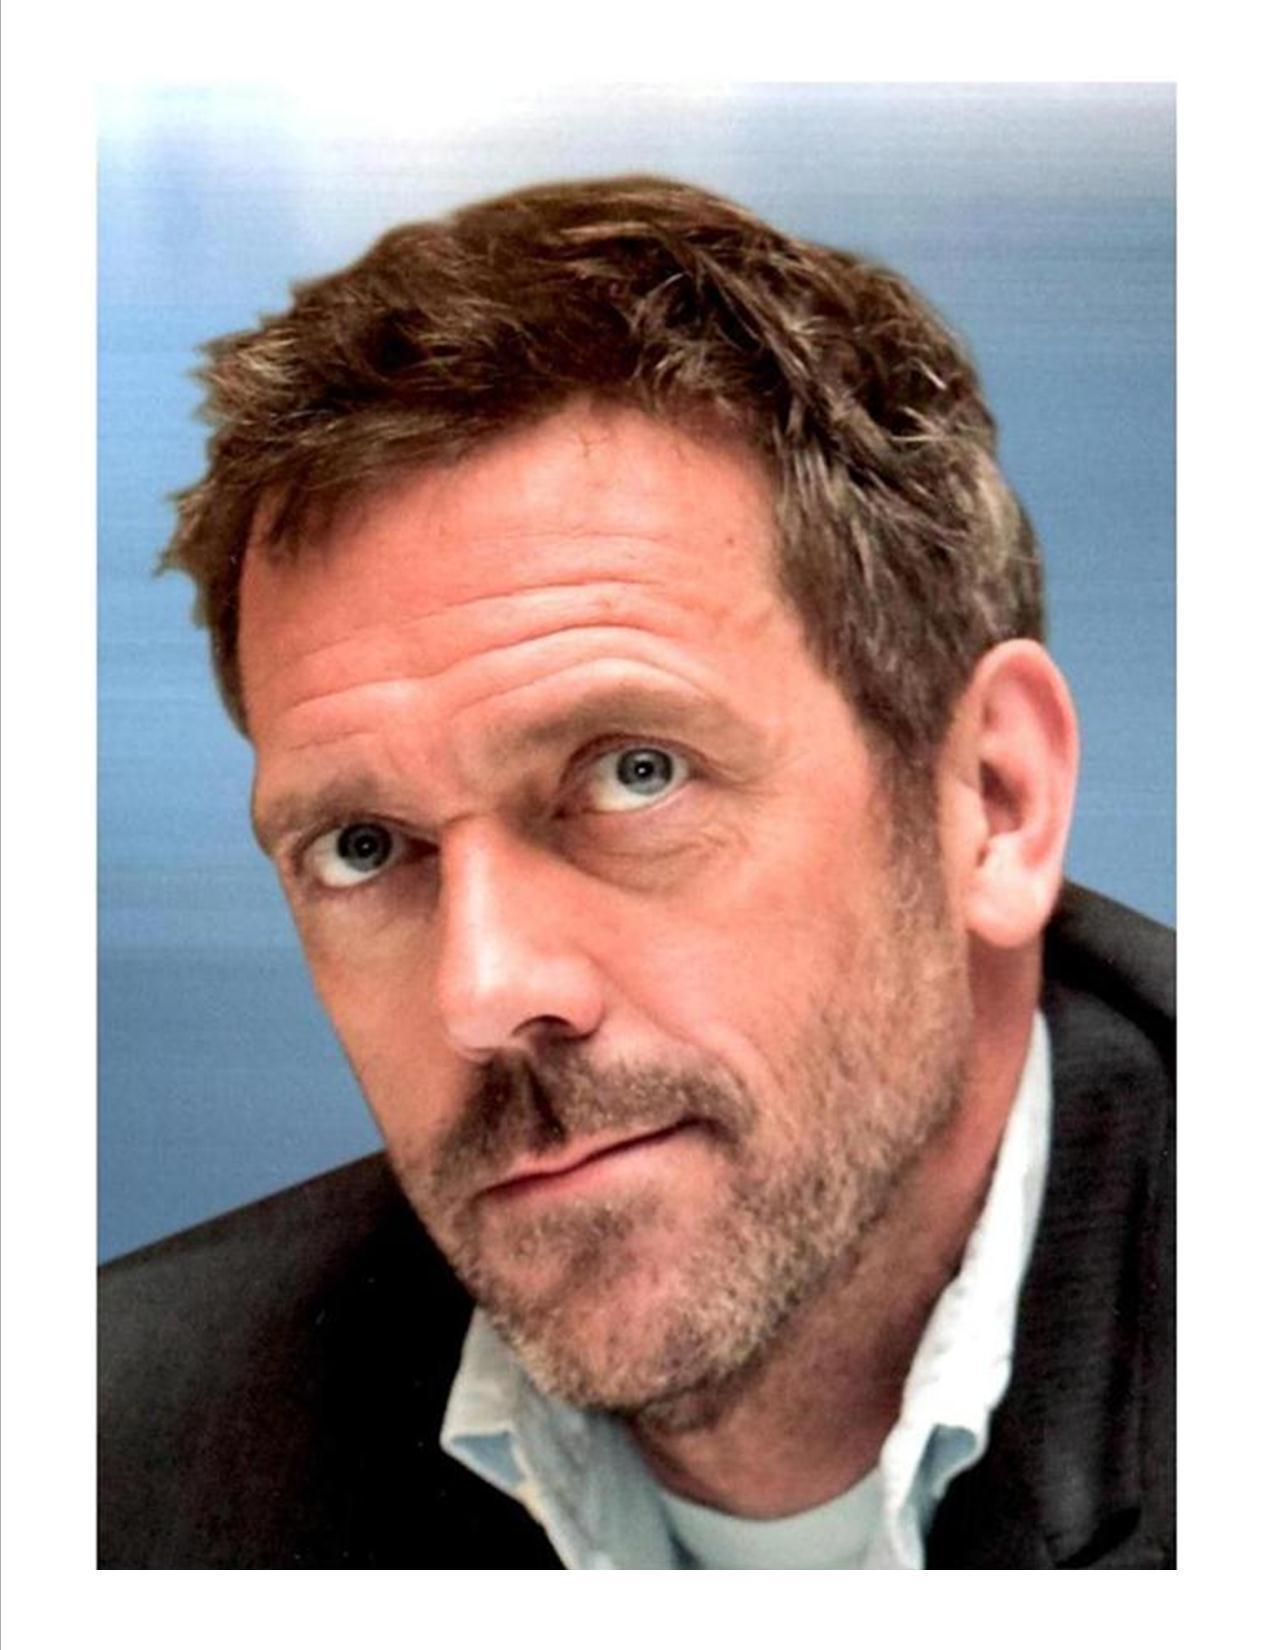 Older (Famous) Men Images Hugh Laurie HD Wallpaper And